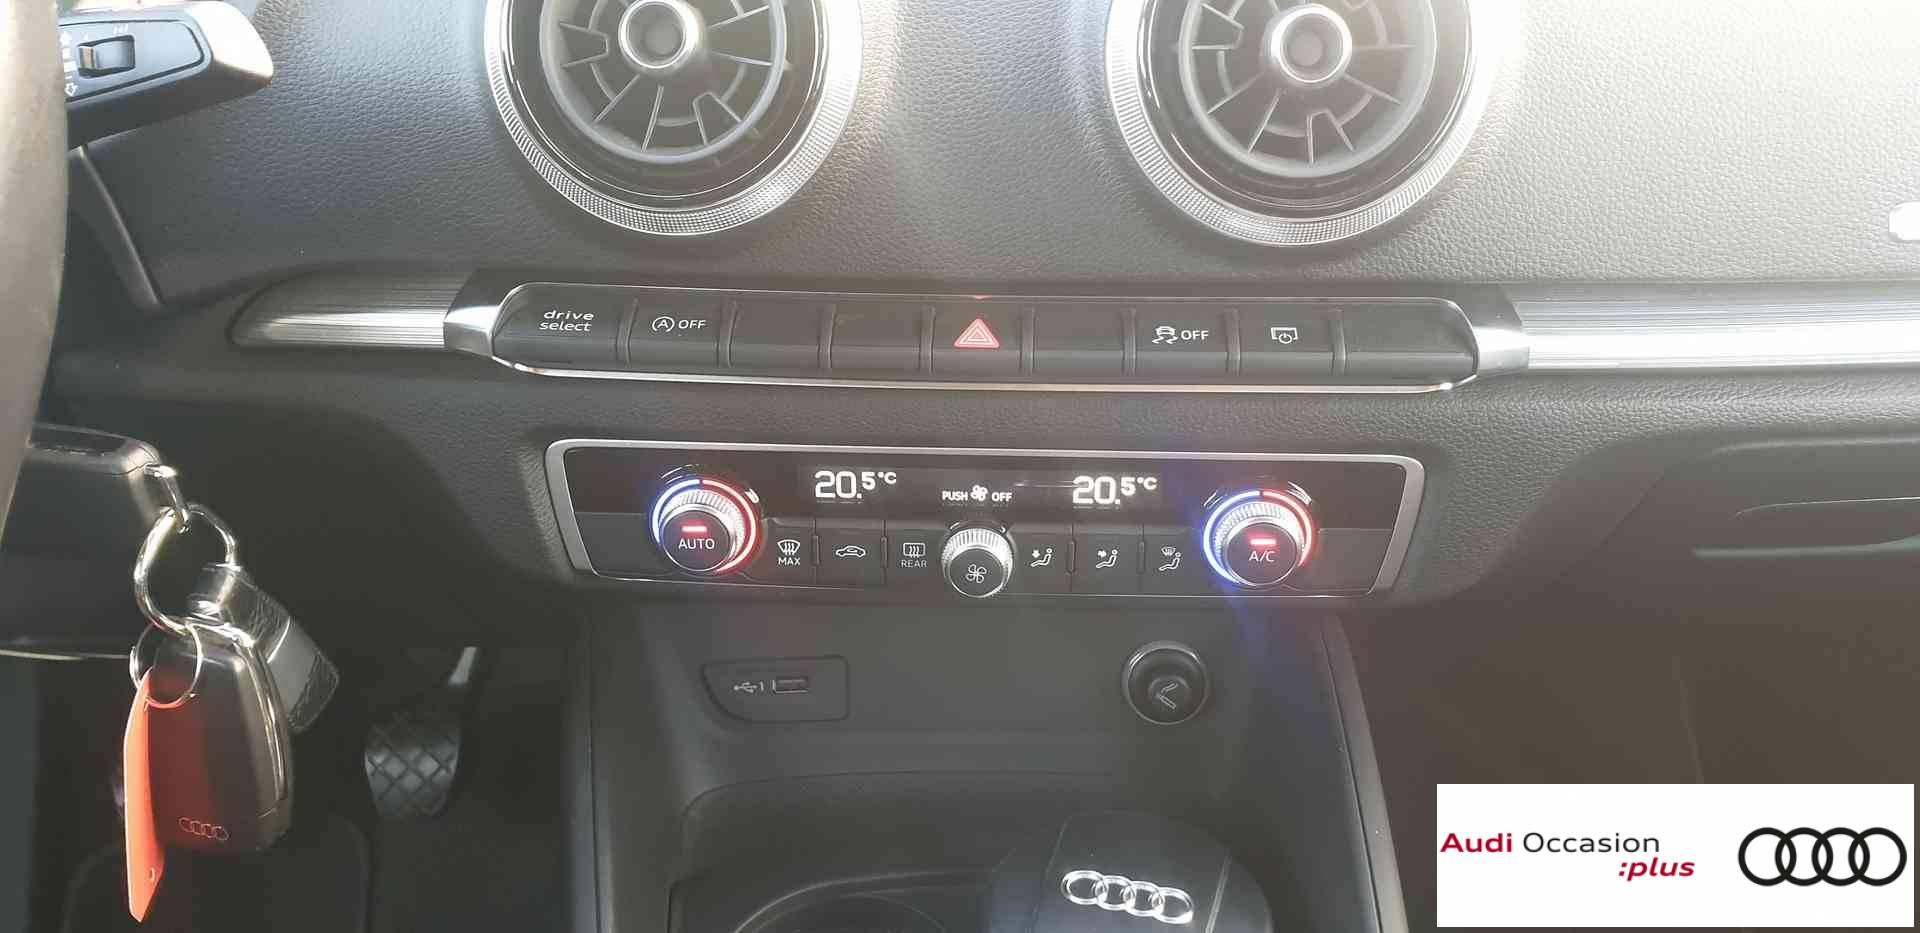 7 - A3 Sportback 1.6 TDI 116